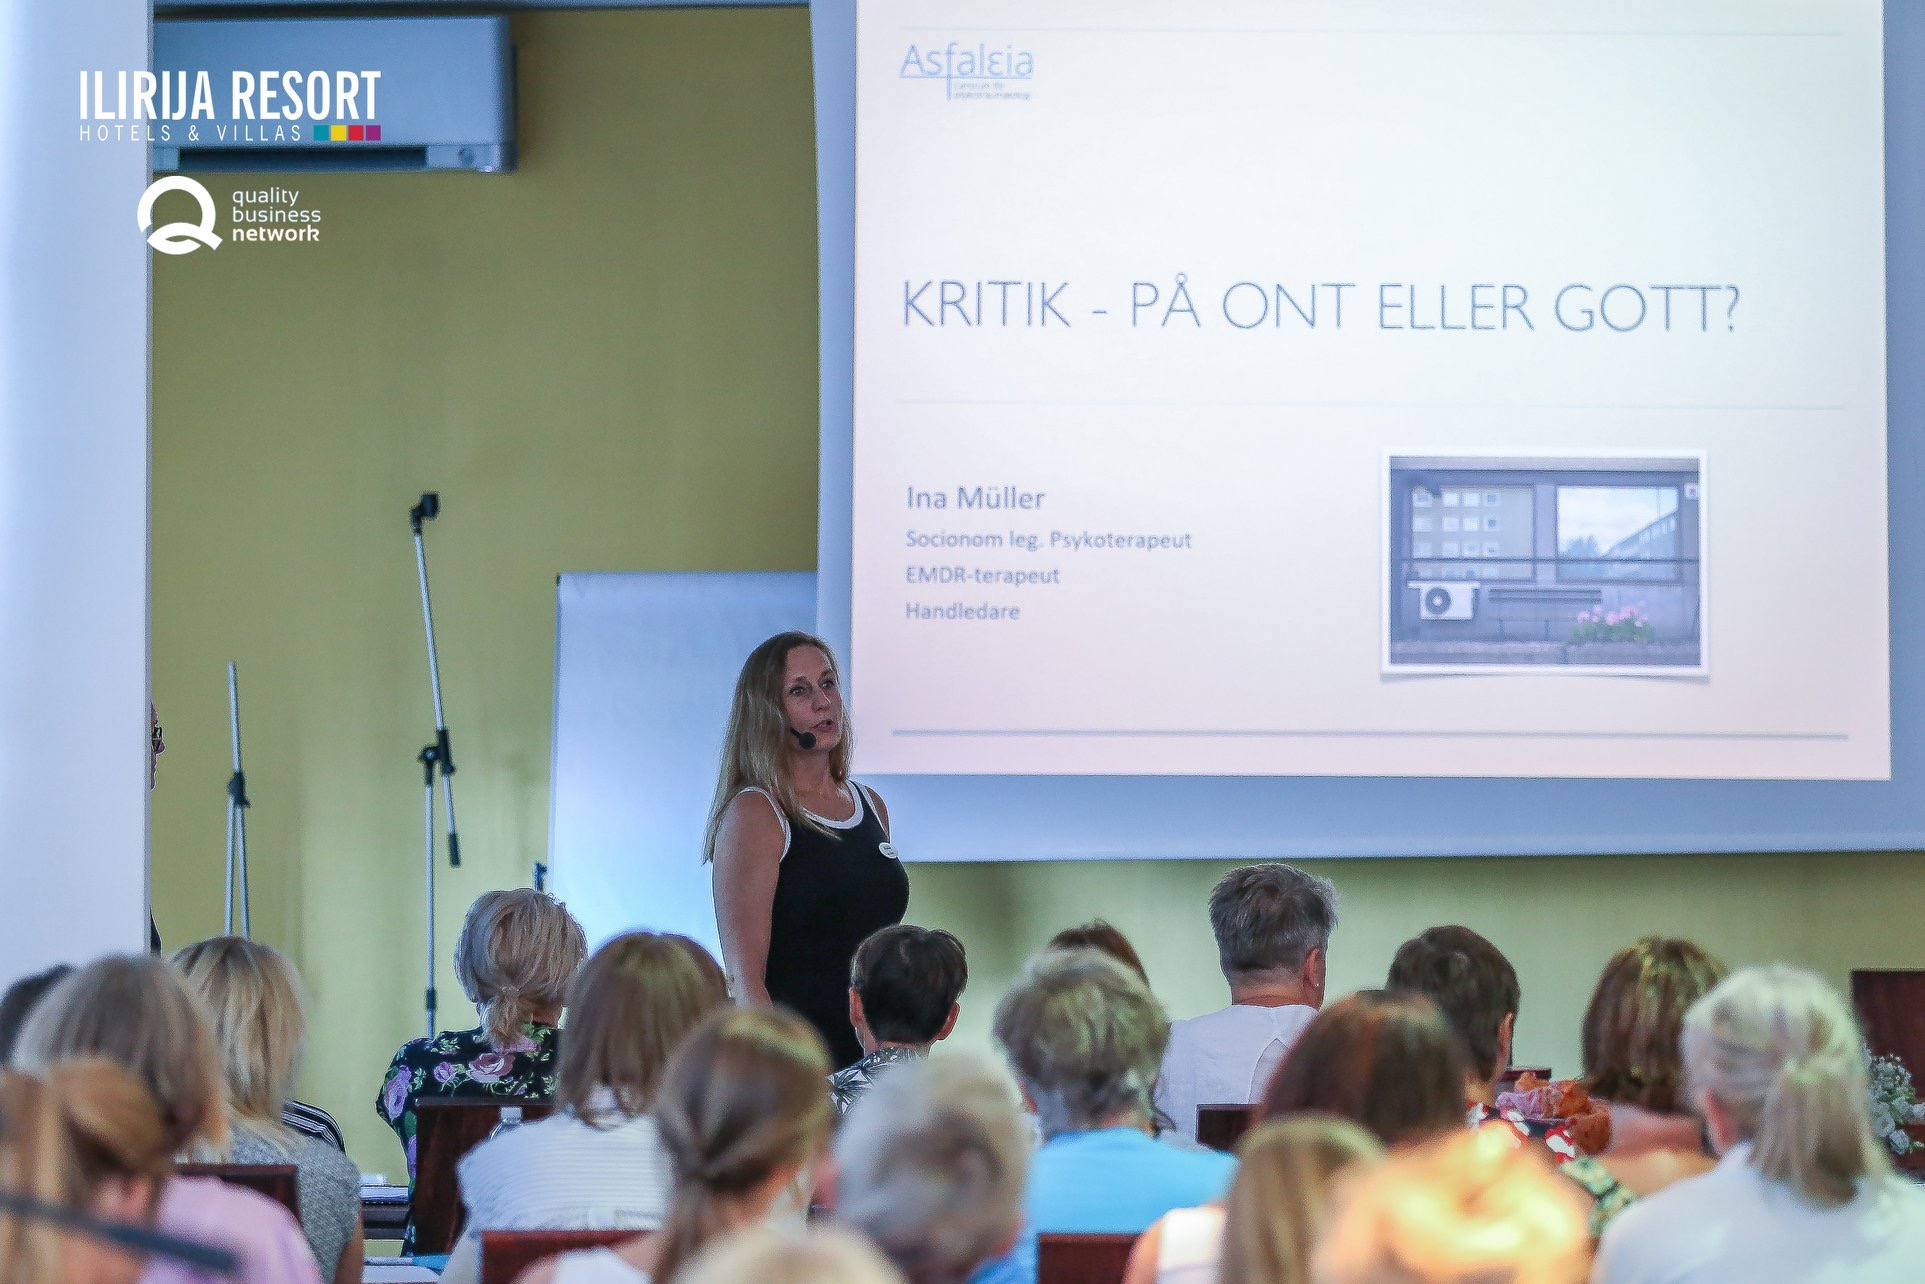 Kritik - på ont eller gott?   Ina Müller